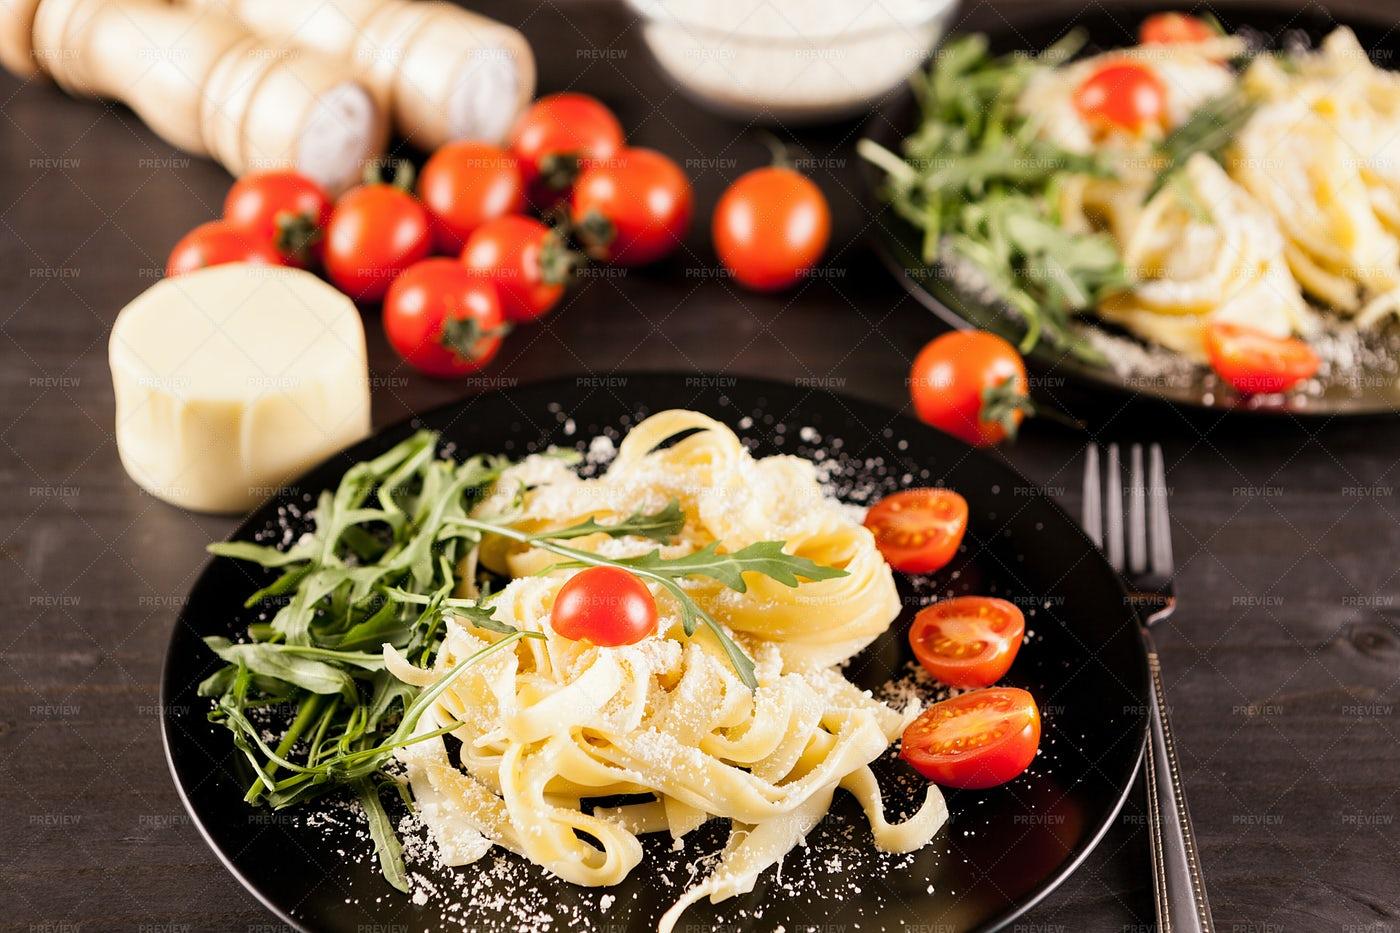 Plate Of Parmesan Tagliatelle Pasta: Stock Photos